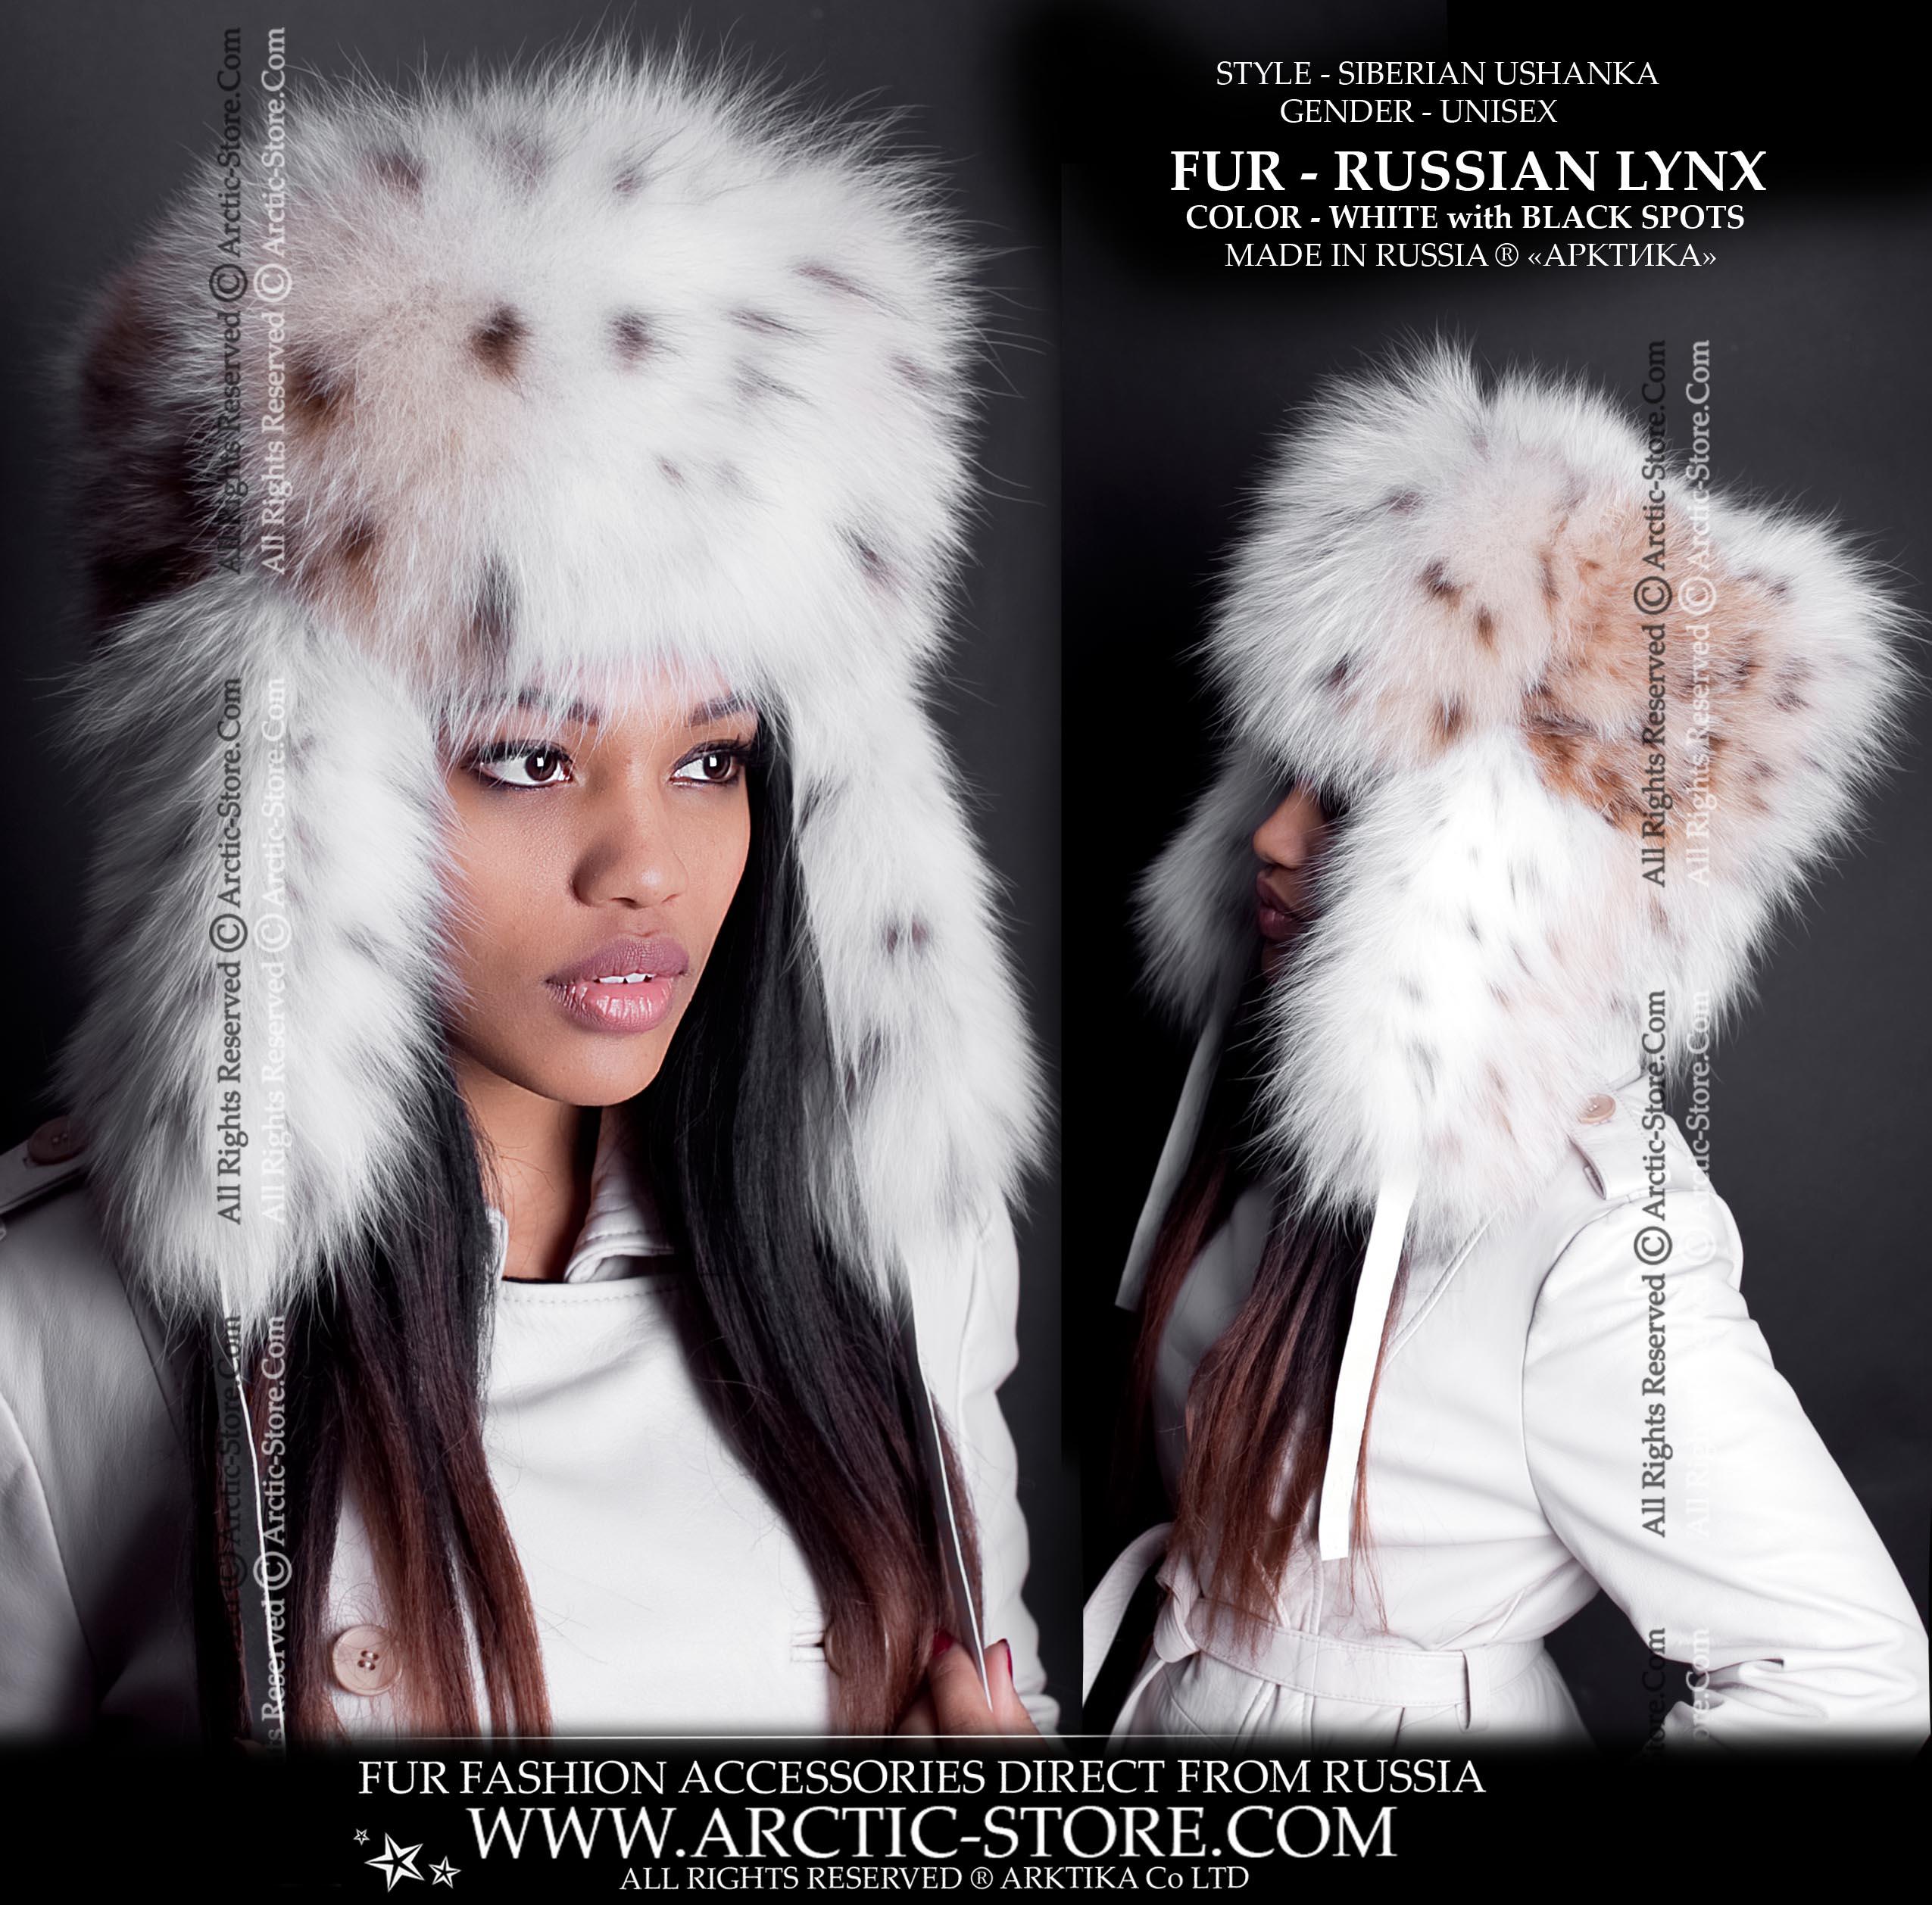 34cad9a398568 Ushanka Russian lynx - lynx fur hat - arctic-store